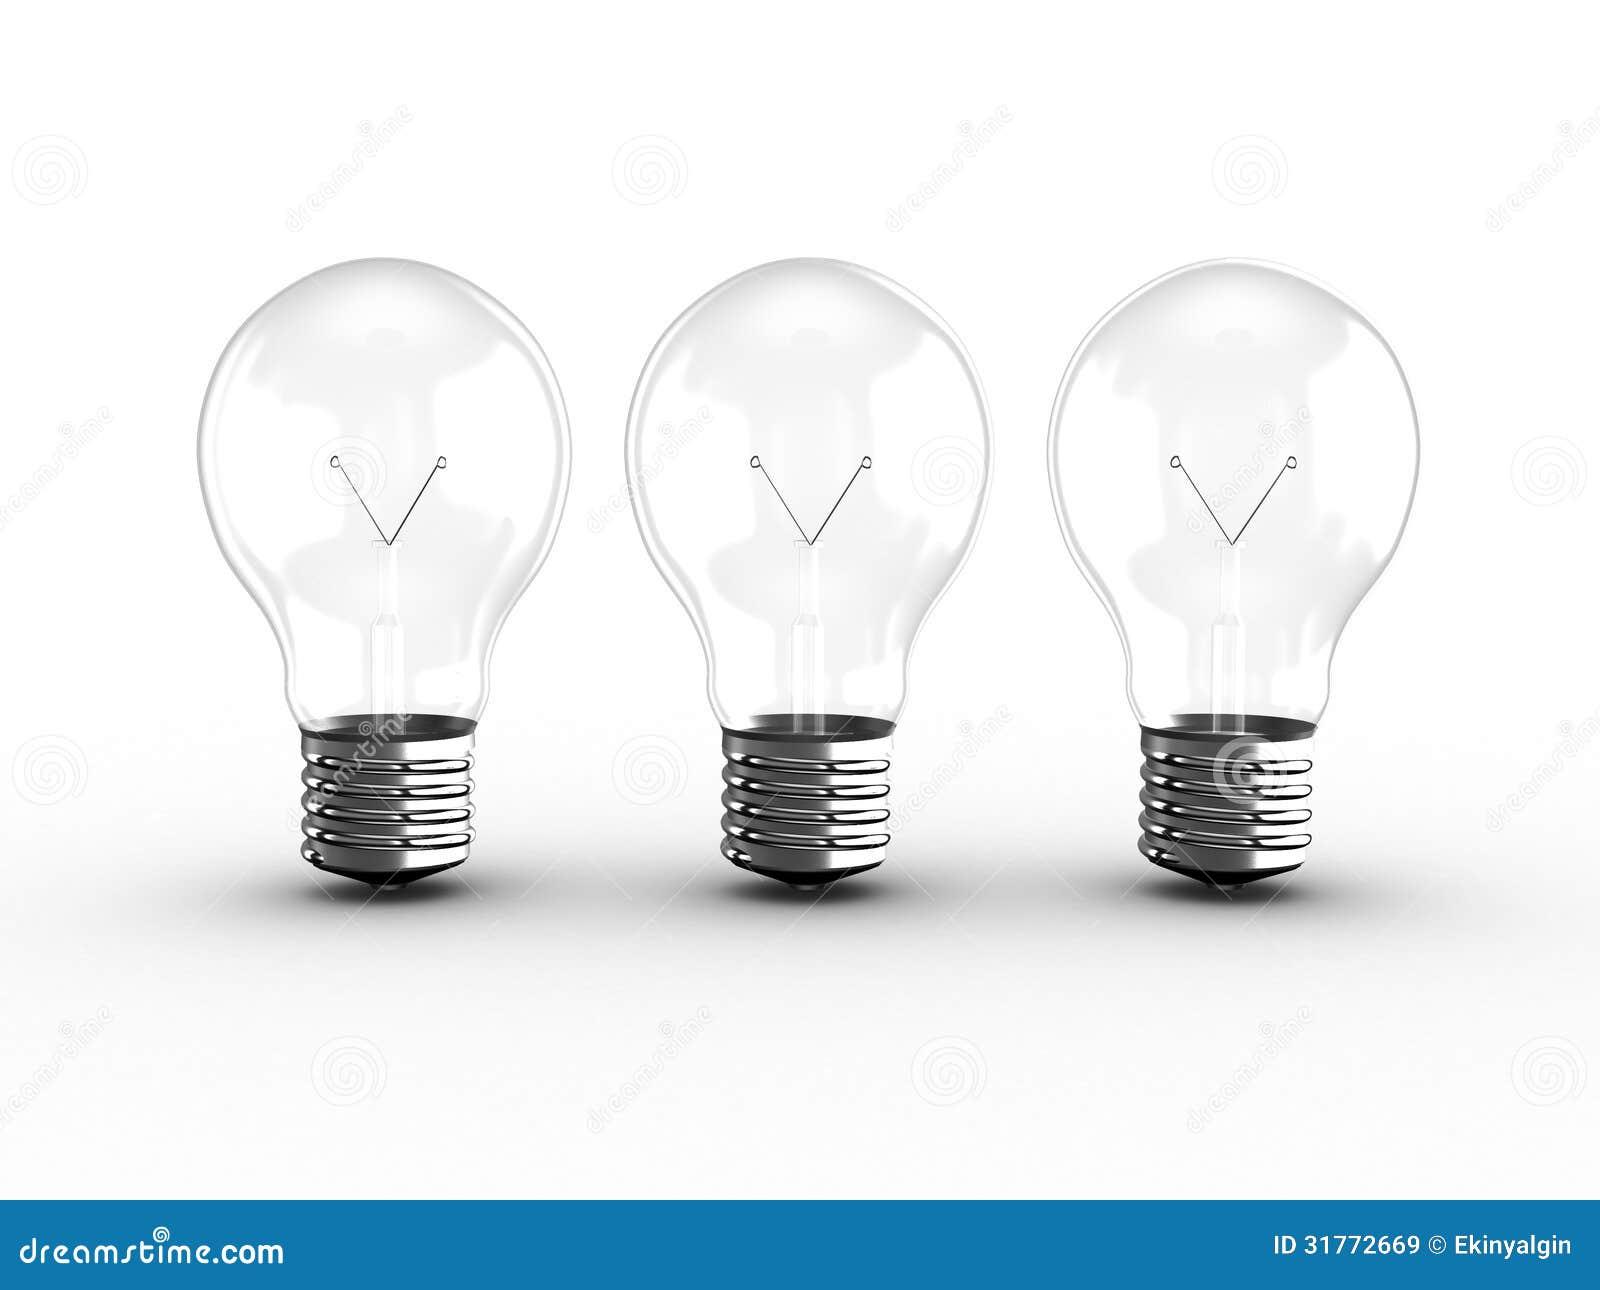 Transparent Light Bulb Group Stock Illustration Illustration of